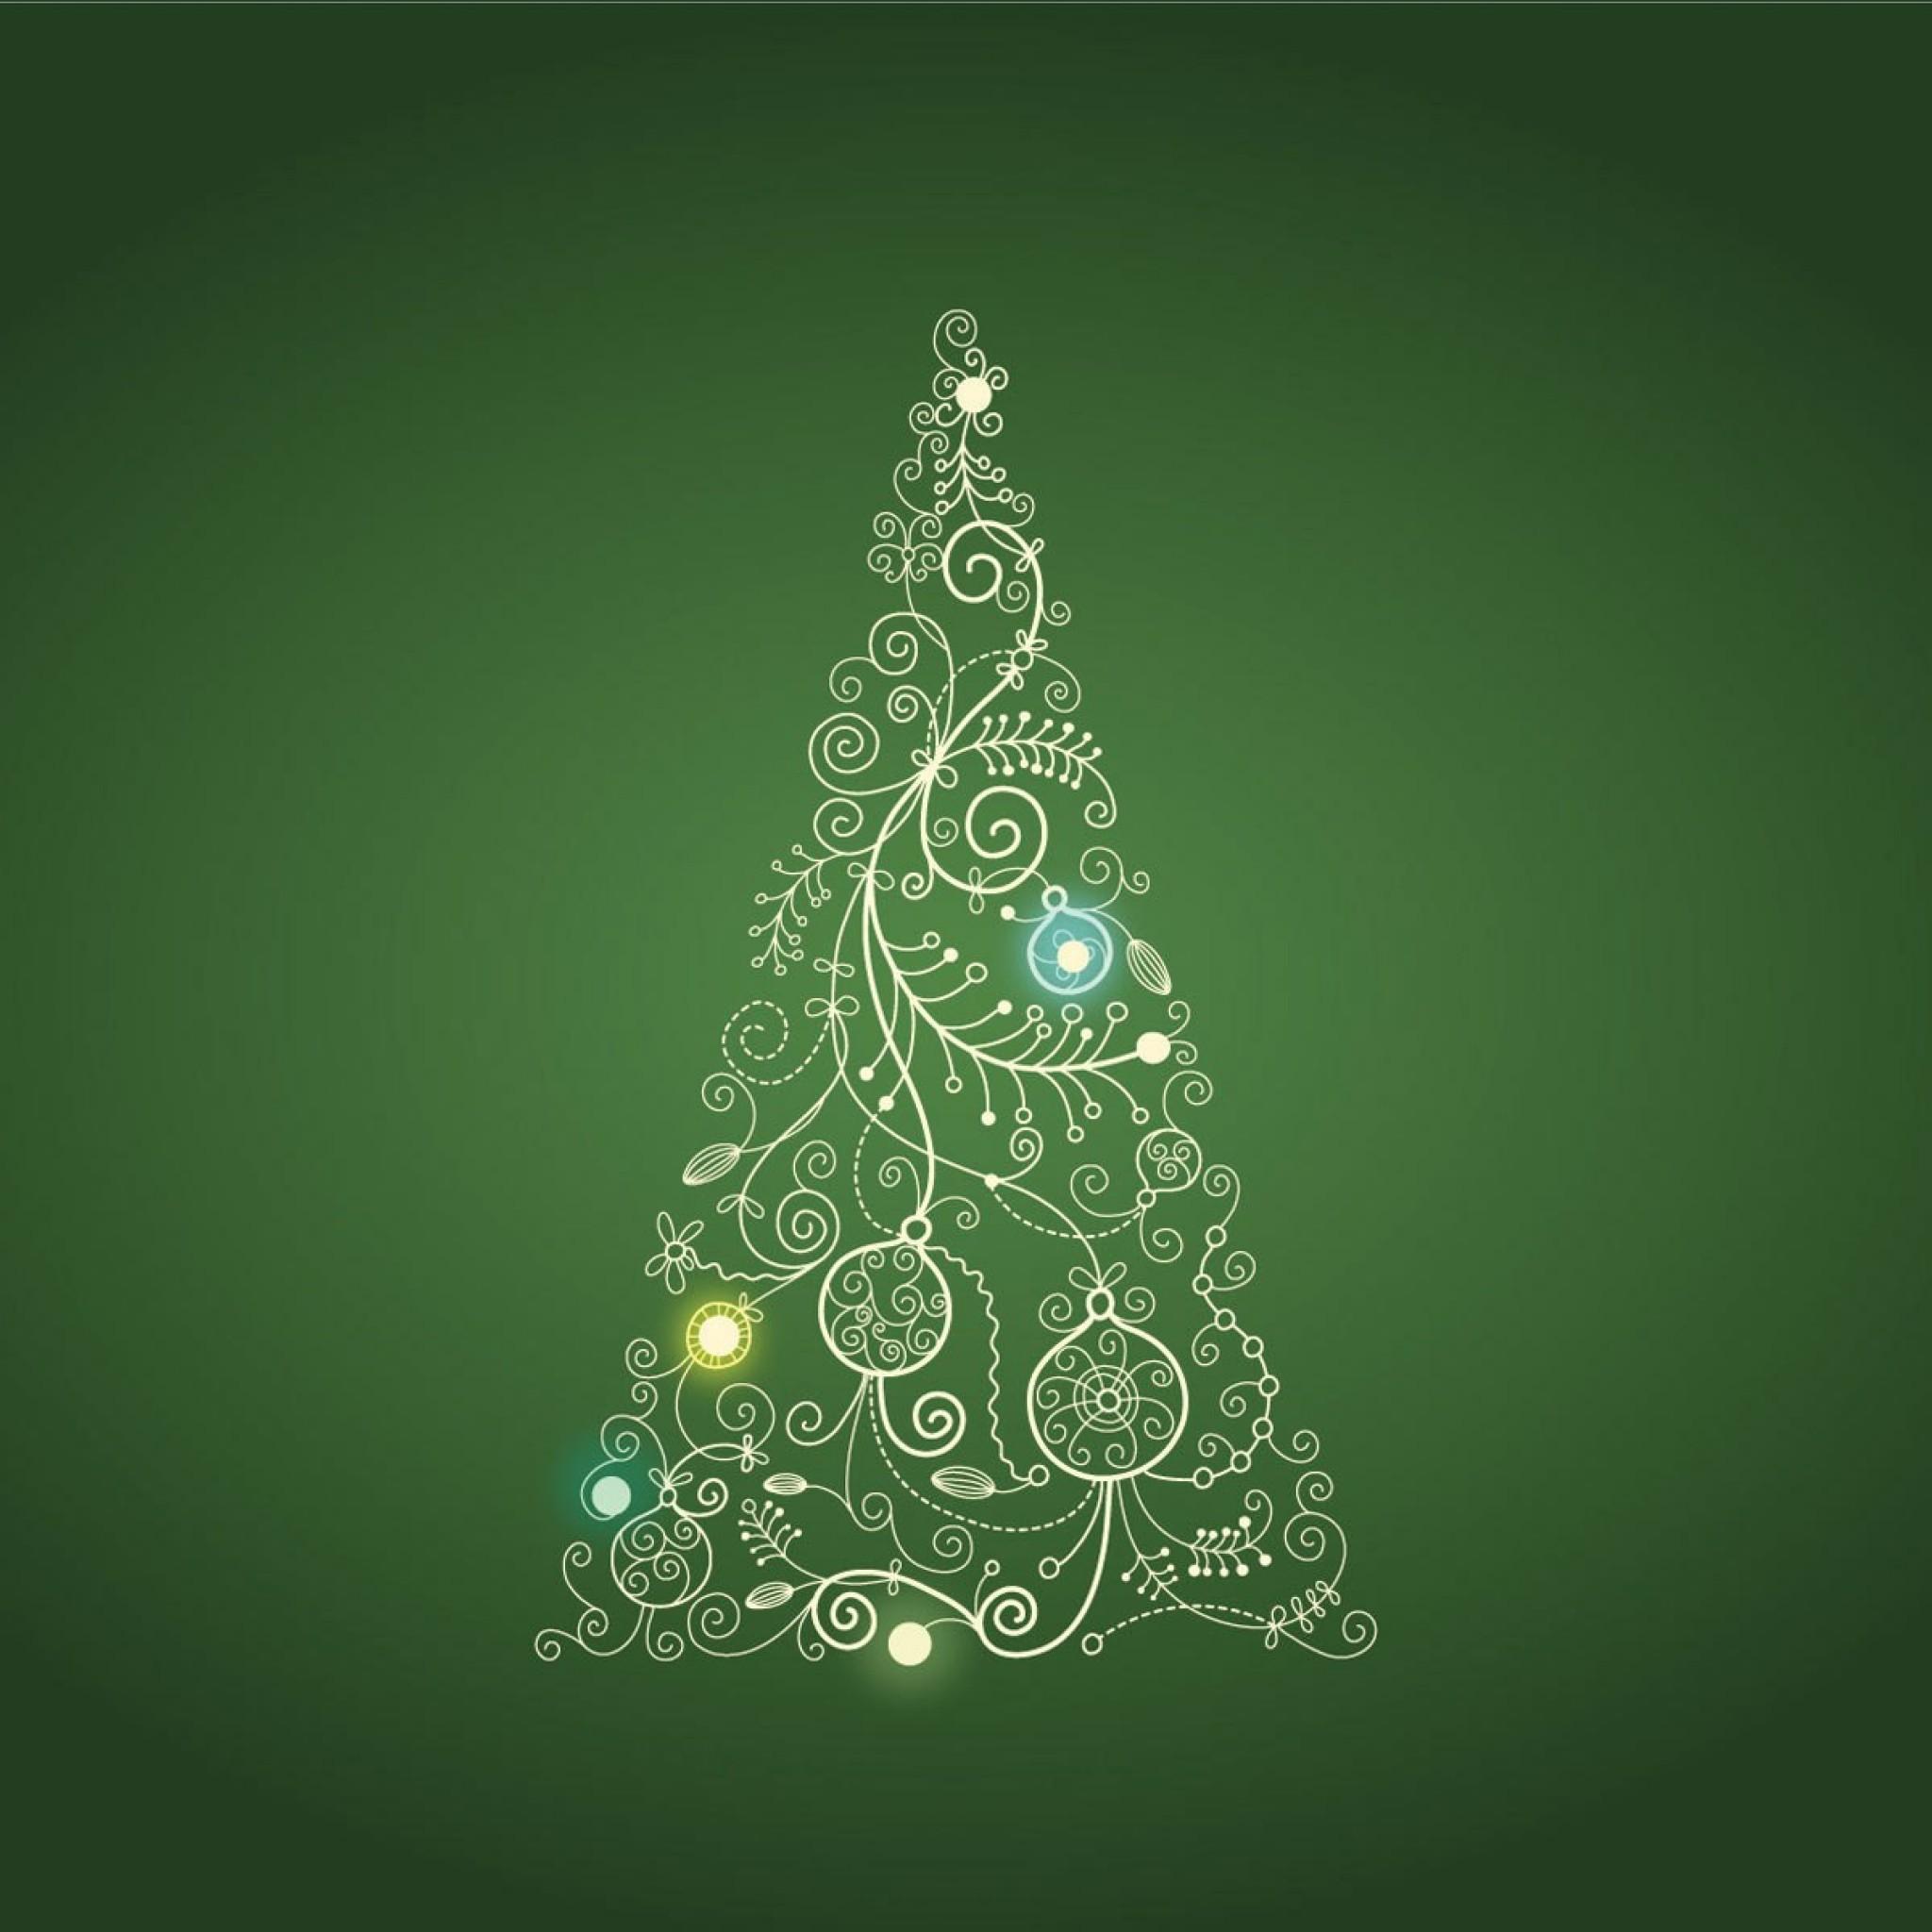 1389 2: Christmas Tree on Green Background Illustration iPad wallpaper